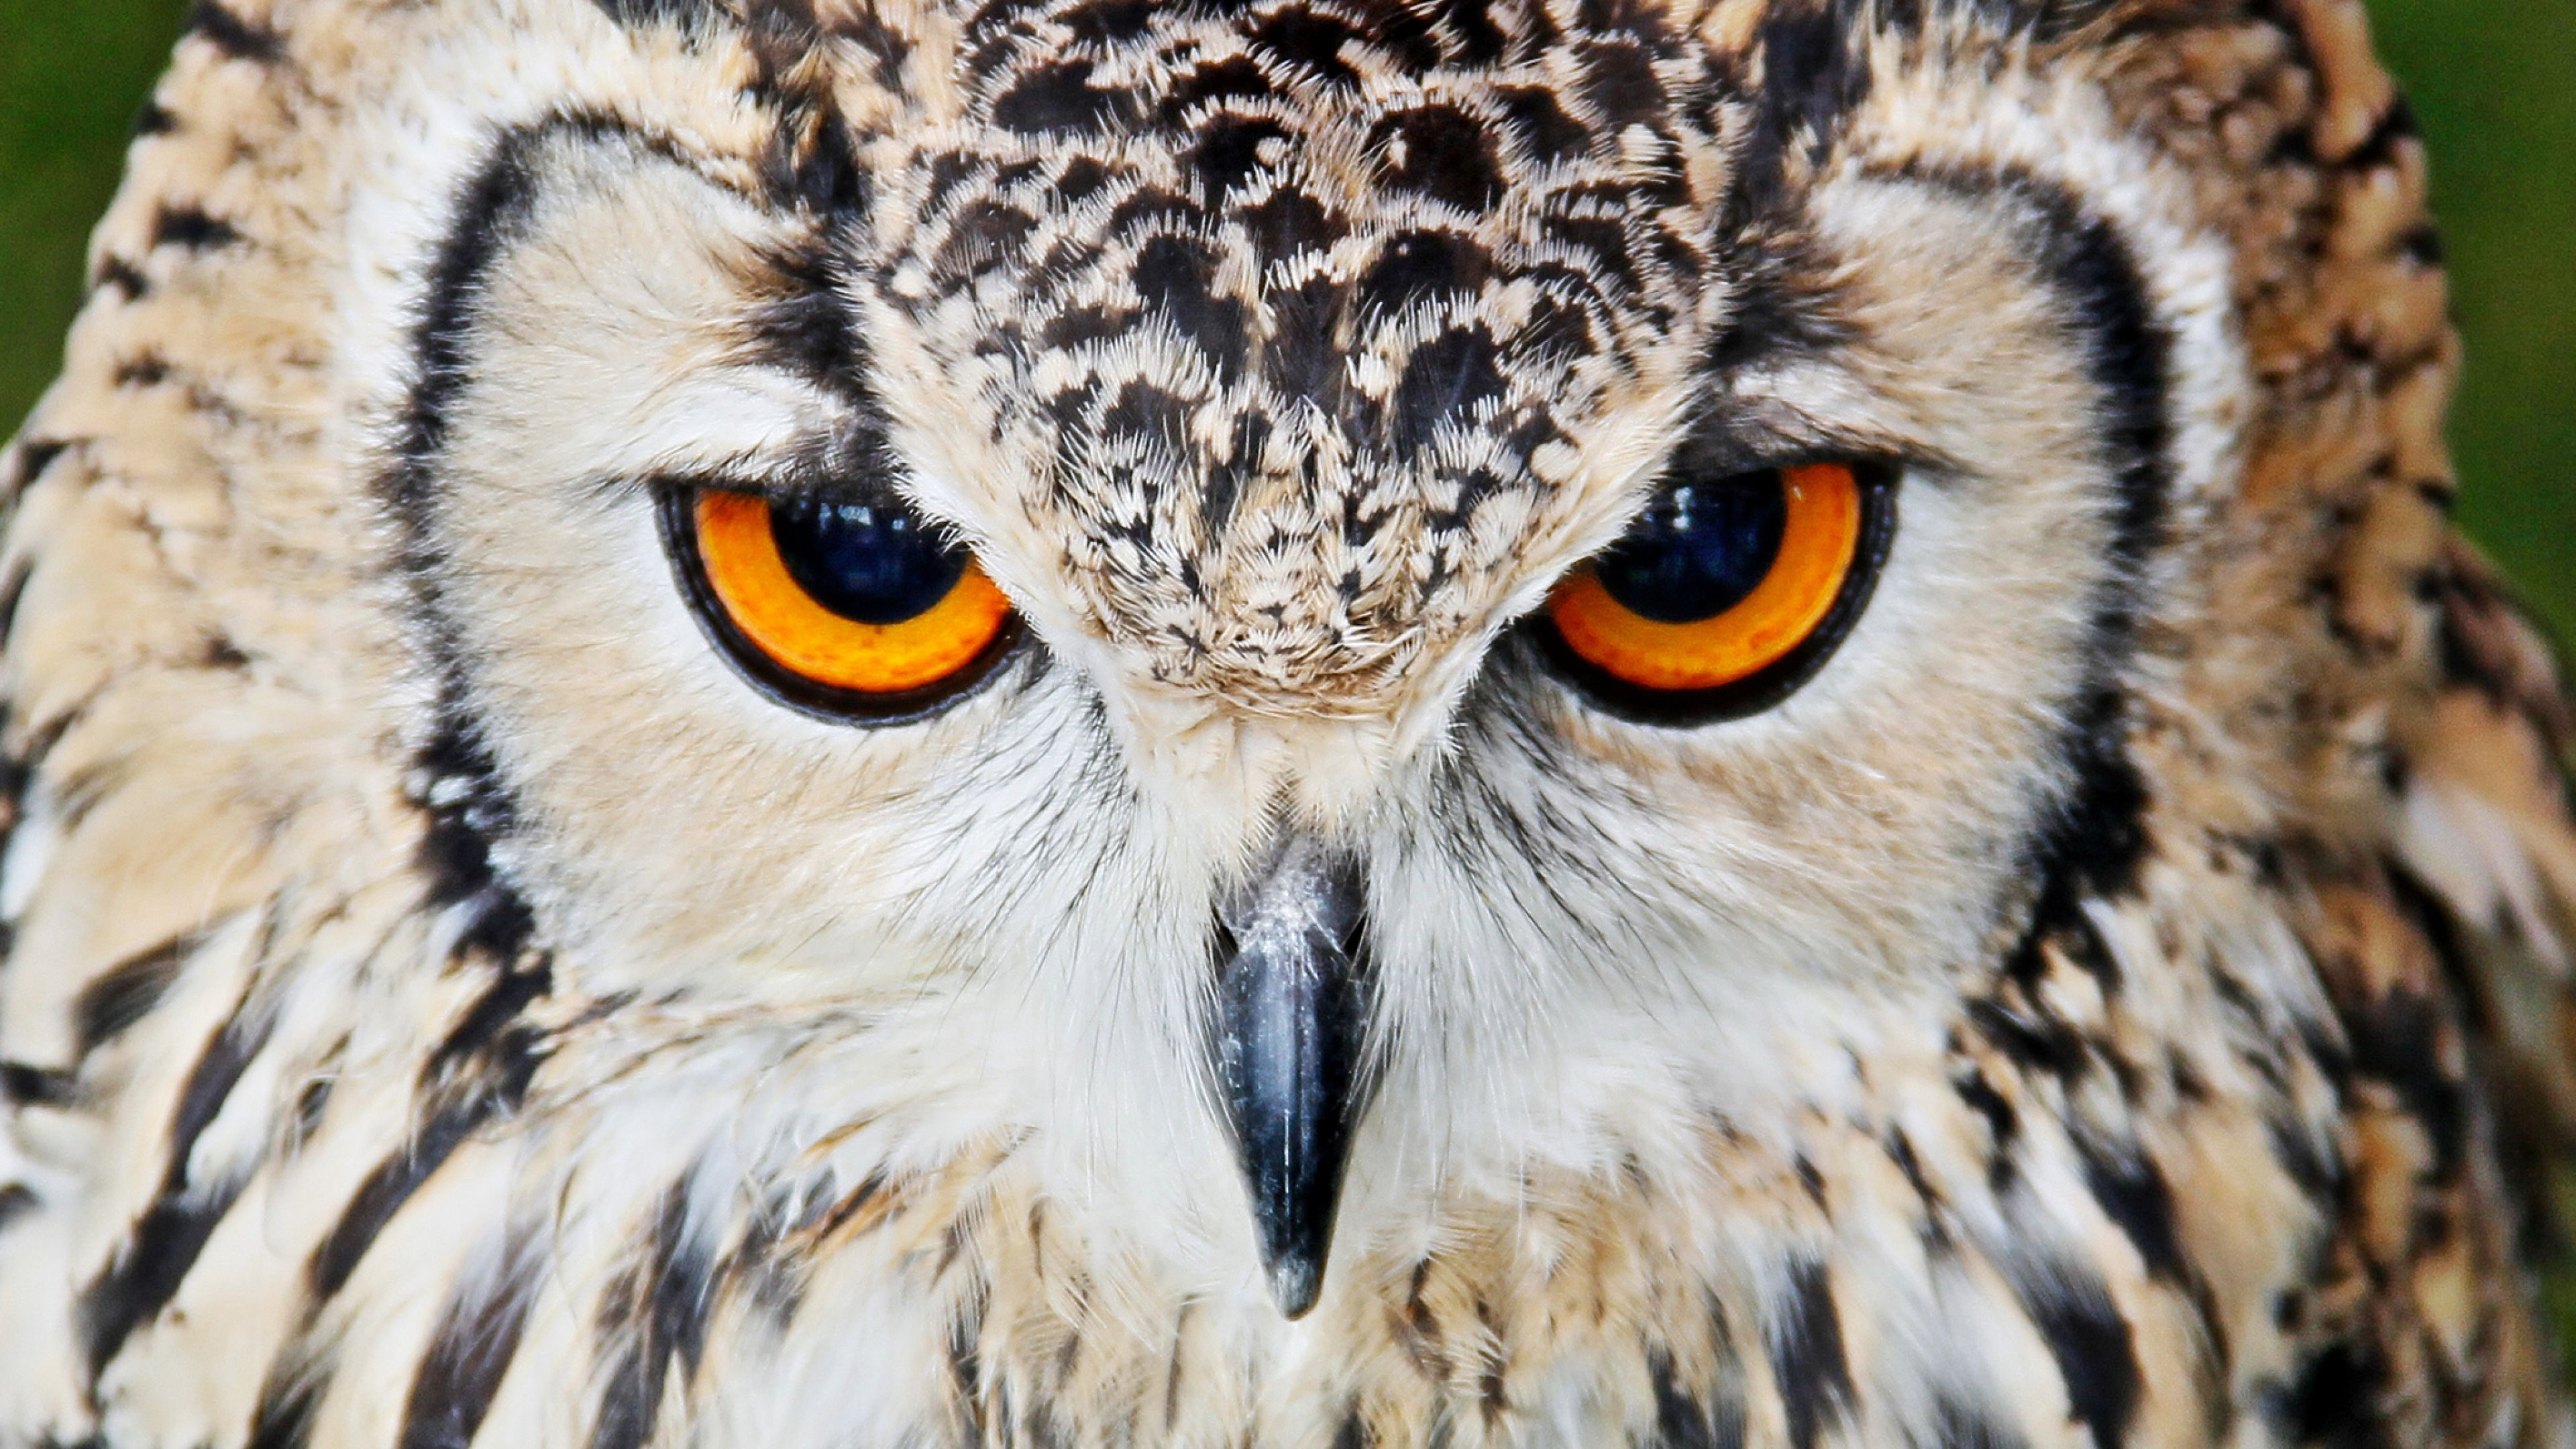 Download Wallpaper 3840x2160 Owl Beak Eyes Close Up 4k Ultra Hd Hd Background Pinturas A Oleo Abstratas Pinturas A Oleo Fotos